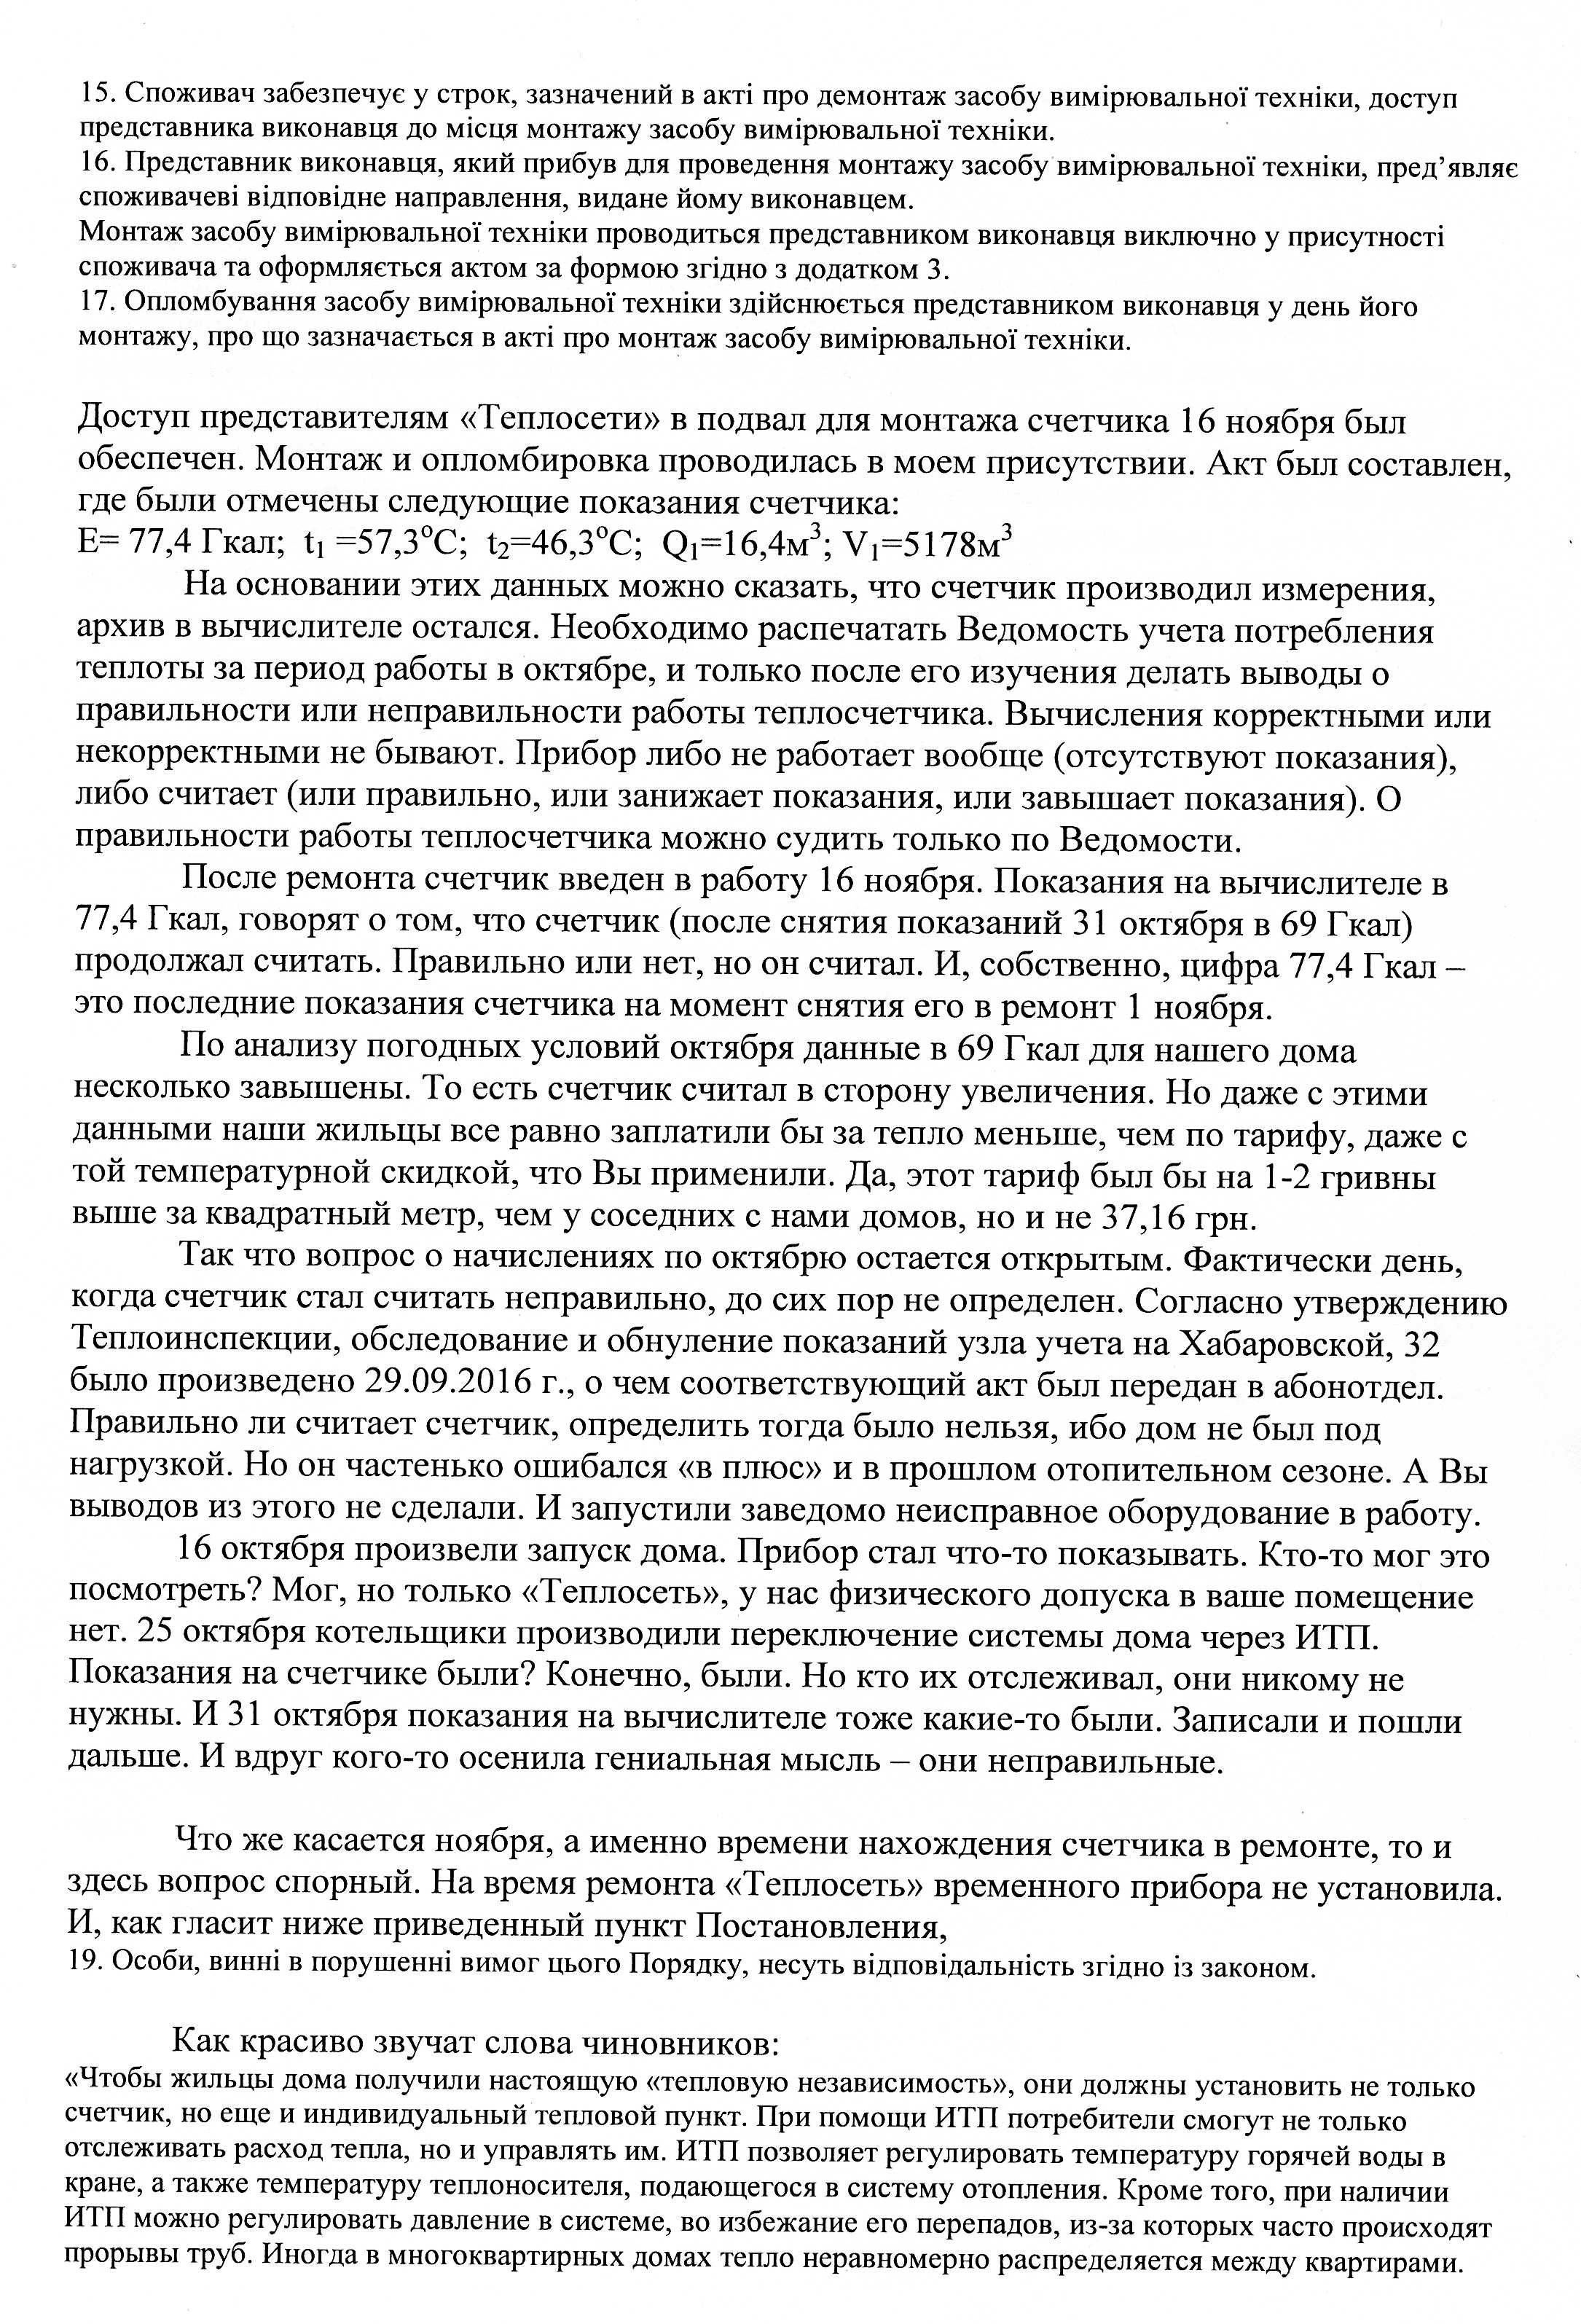 https://img-fotki.yandex.ru/get/98619/248142895.0/0_180ff1_9835b88_orig